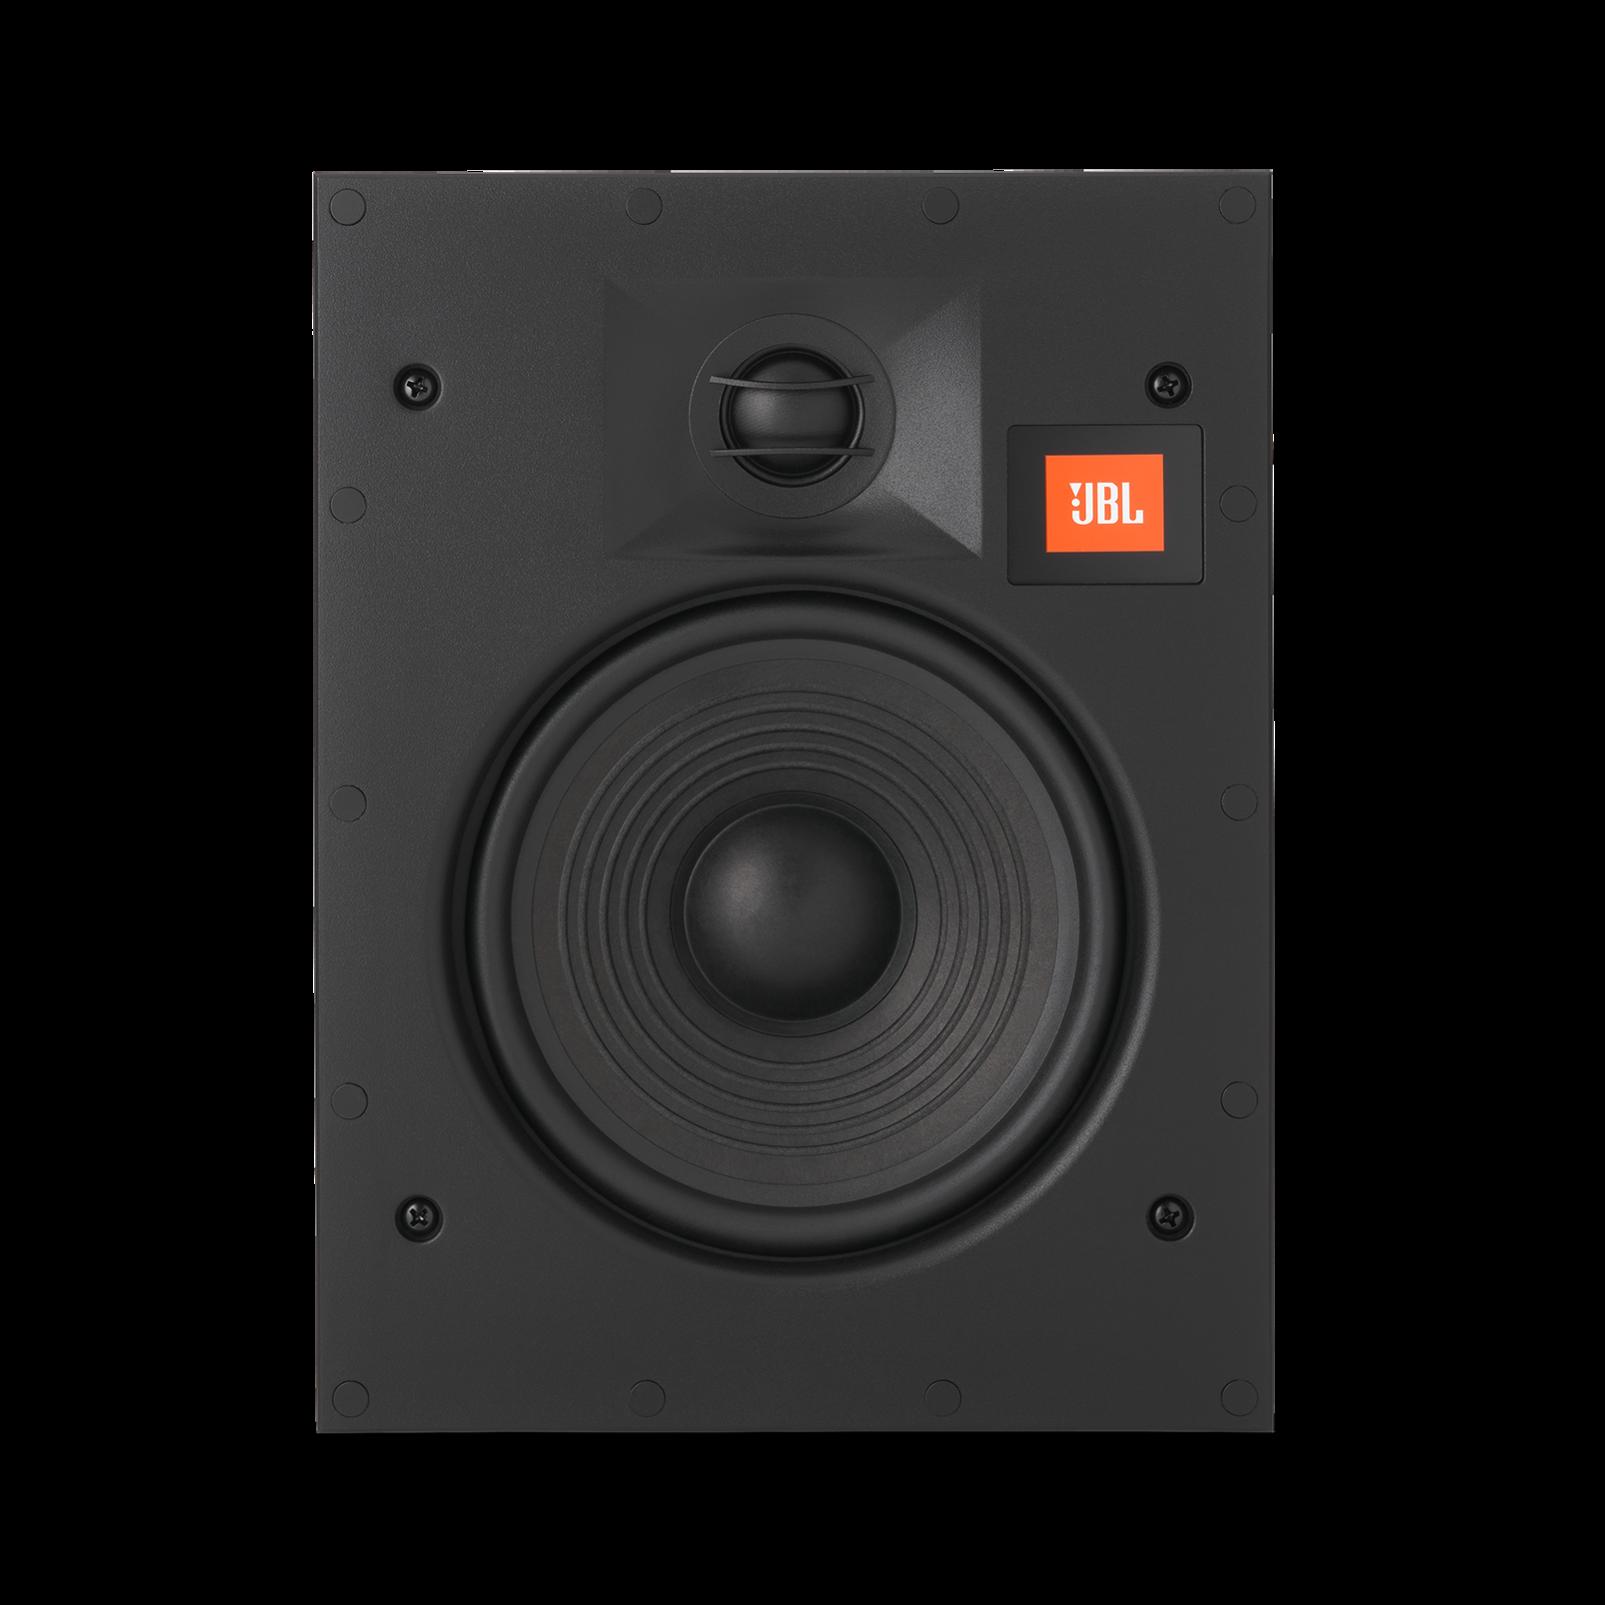 speakers speaker jbl performance white audio item control ceiling sq t